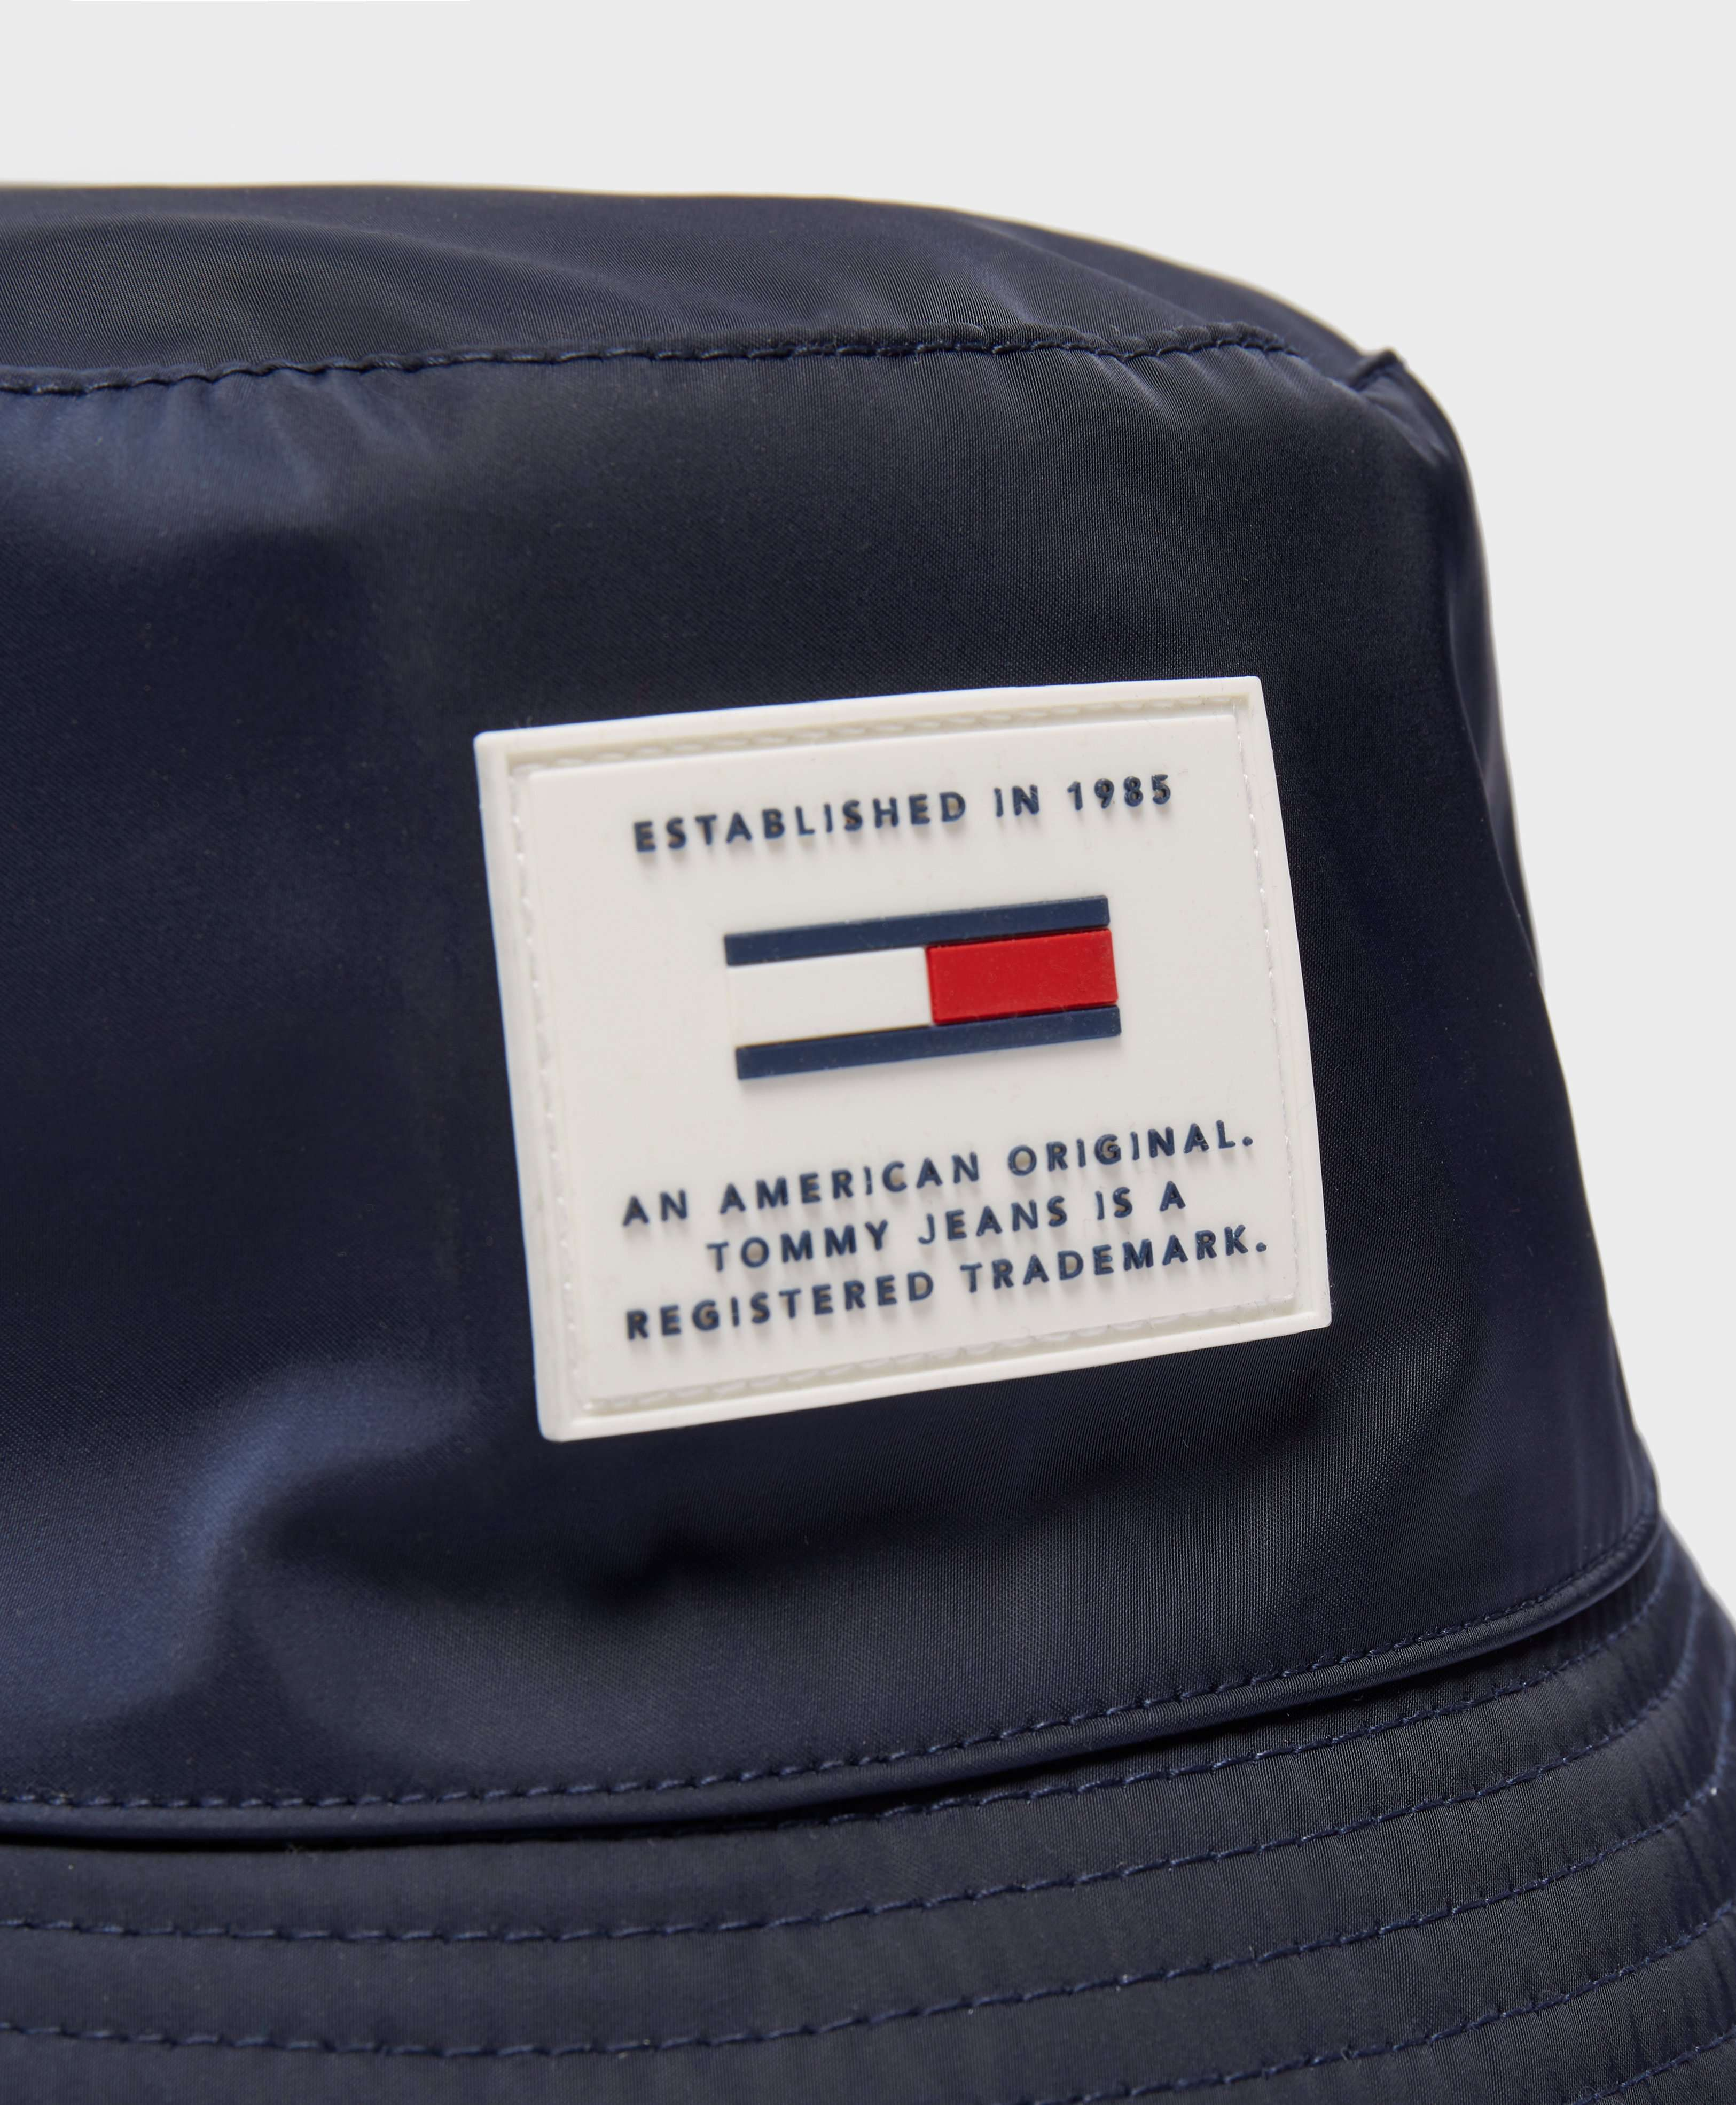 Tommy Jeans Reversible Winter Bucket Hat - Online Exclusive